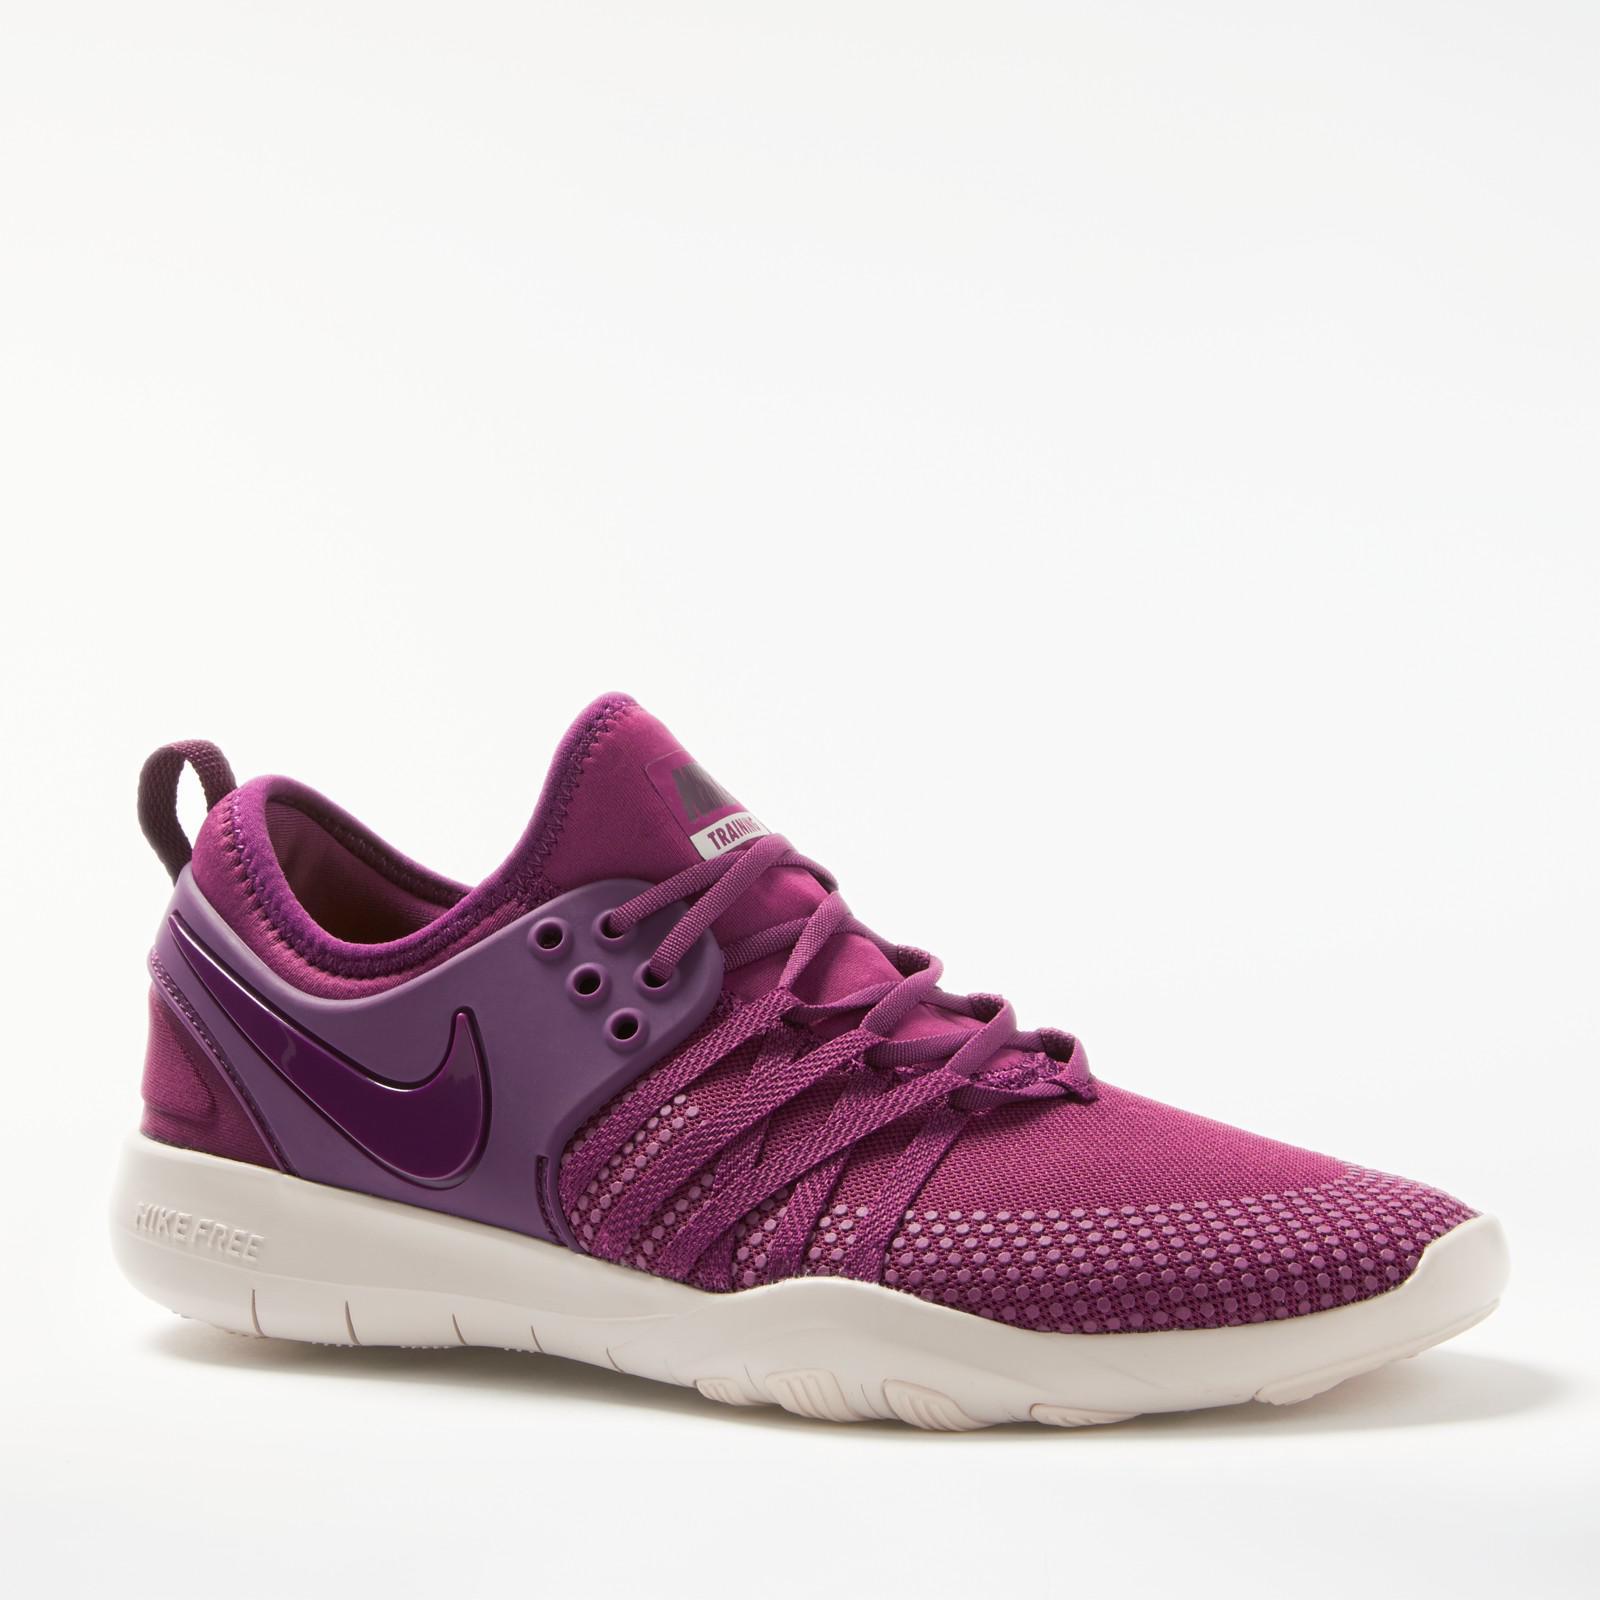 Nike Rubber Women's Free Tr 7 Training Sneakers From Finish Line in Purple